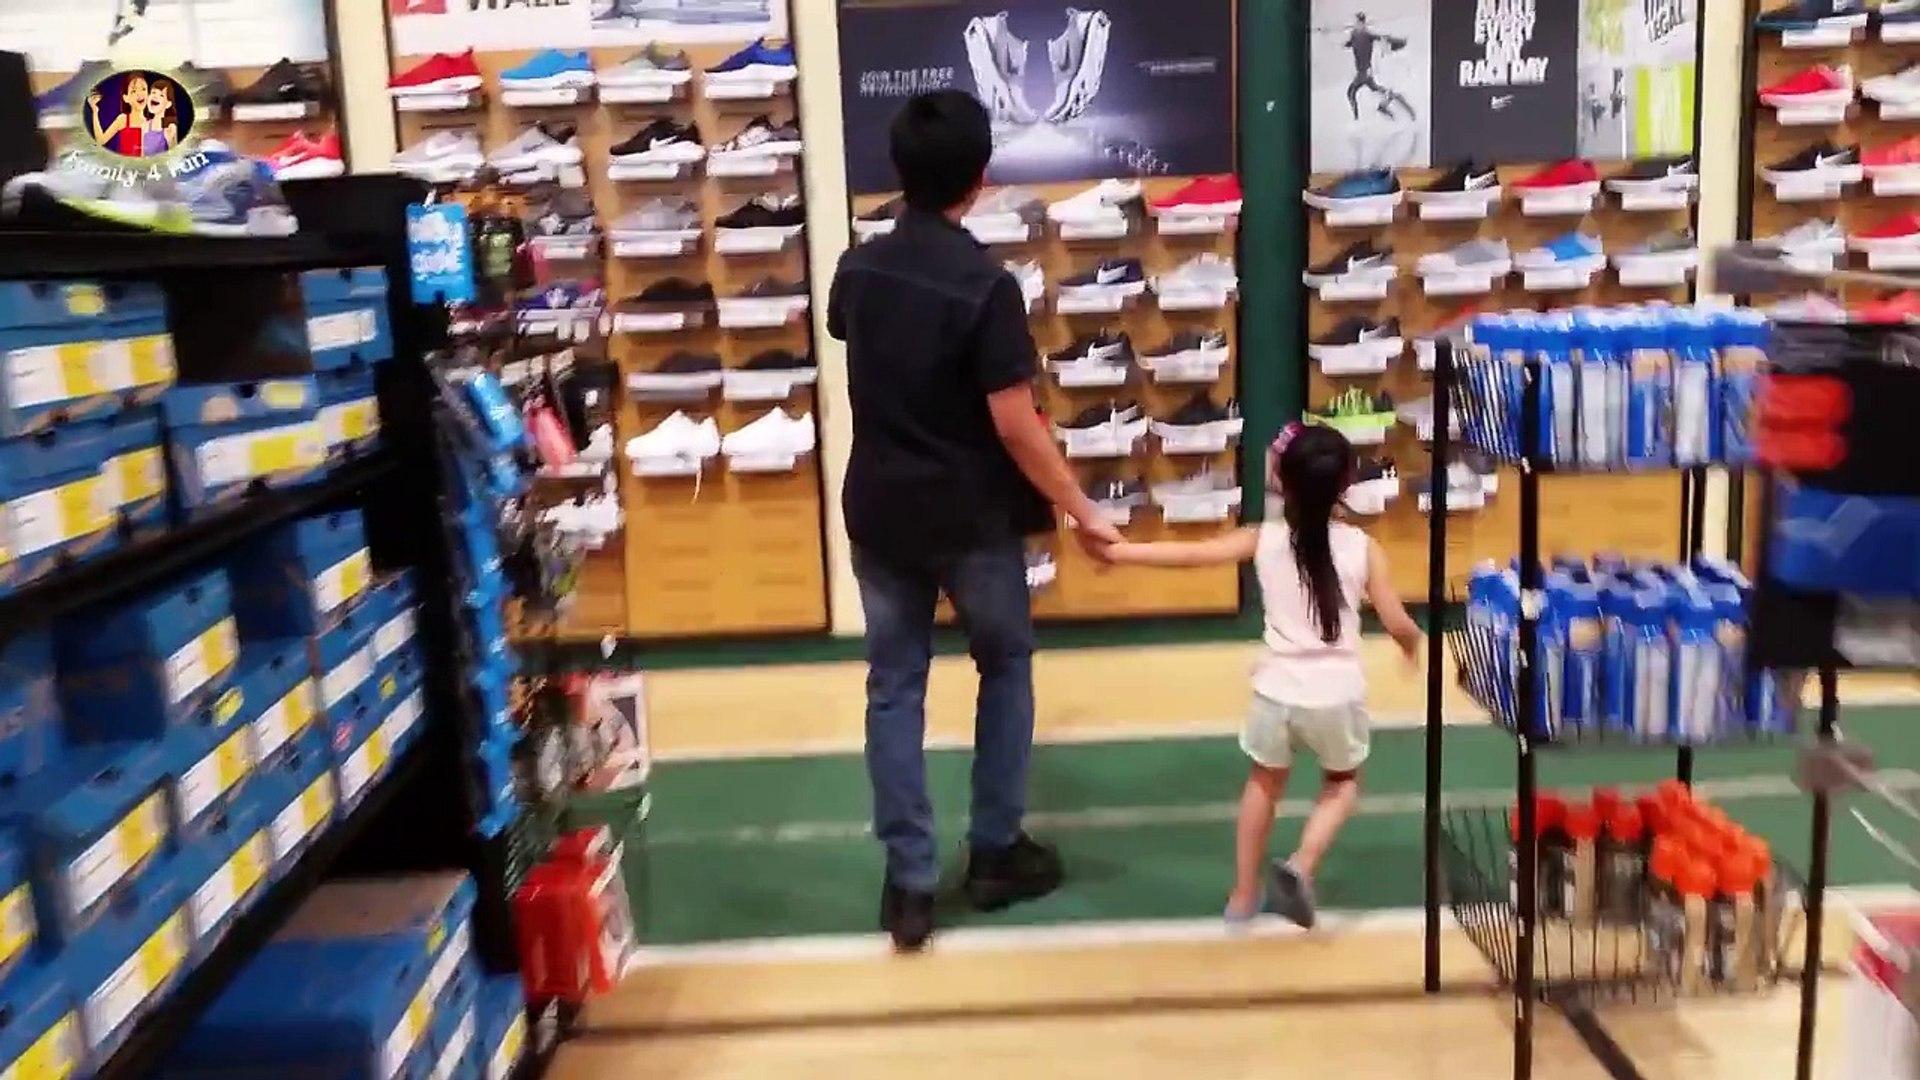 Nike Flyware Red Running Shoes Dicks's Sporting Goods Shoe Haul Family 4 Fun